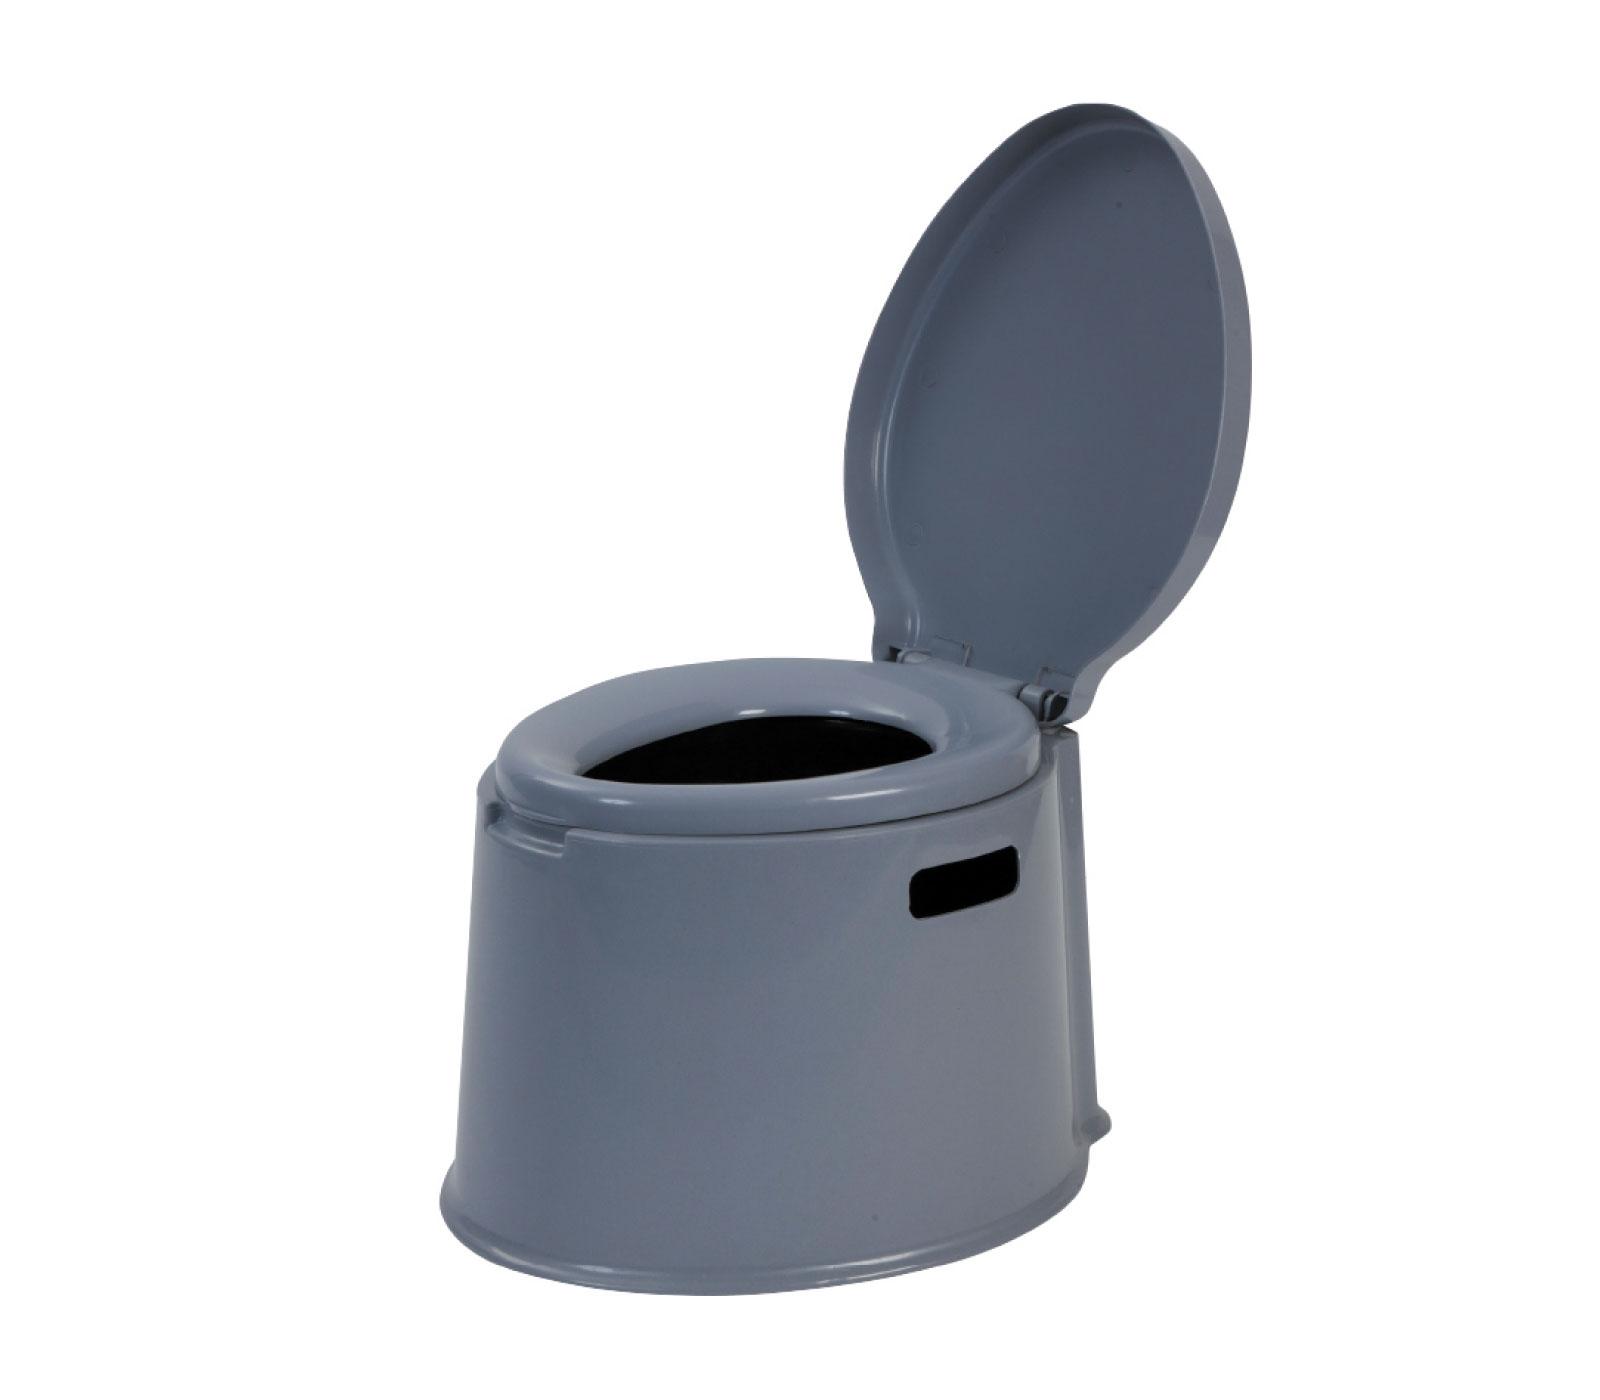 Redwood Draagbaar Toilet